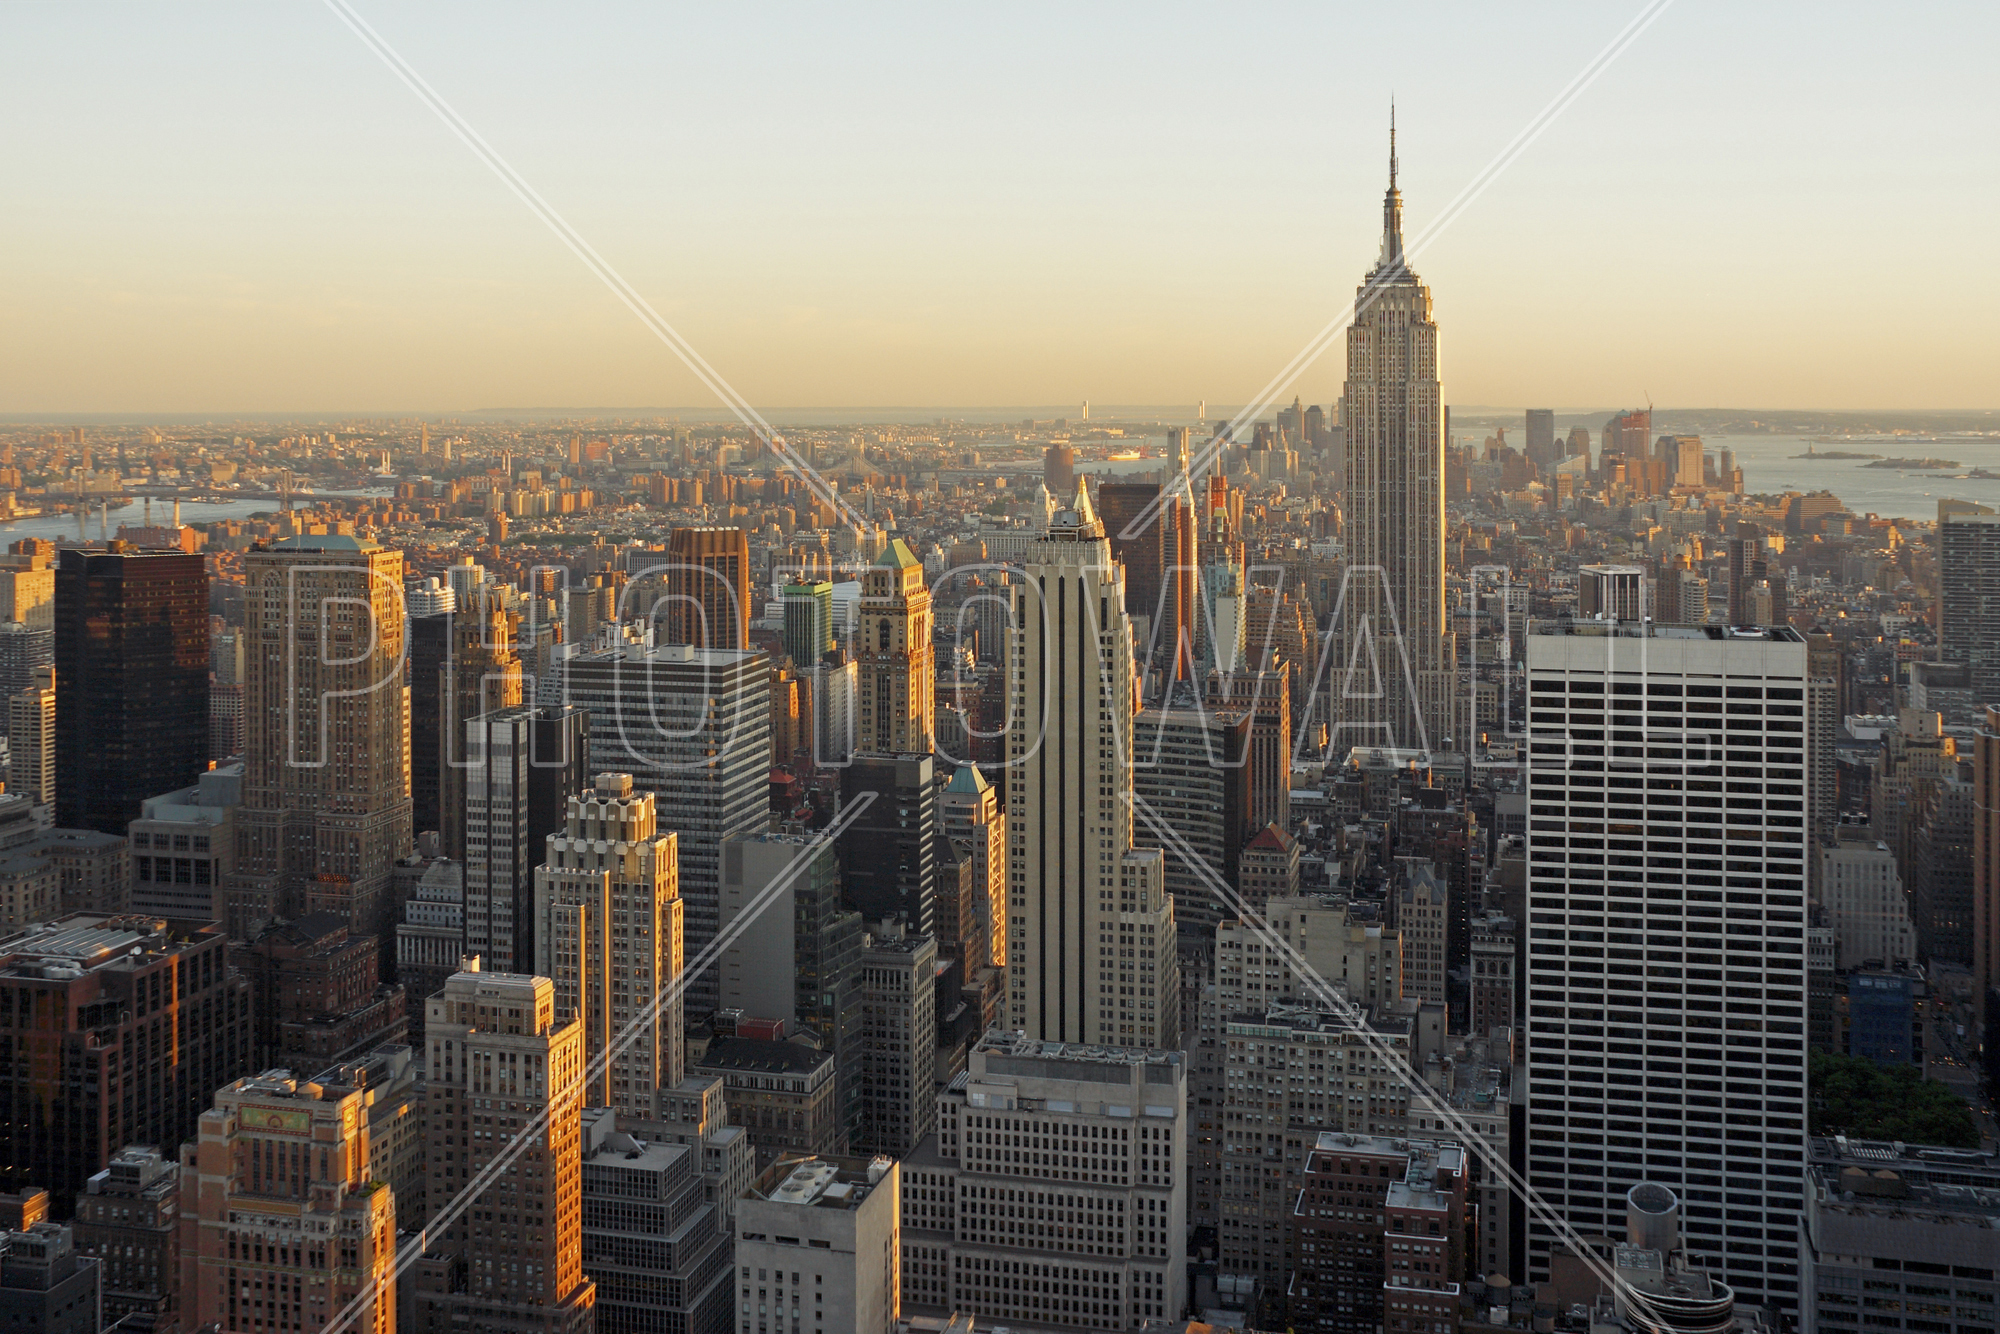 Orte in NYC gelegt werden